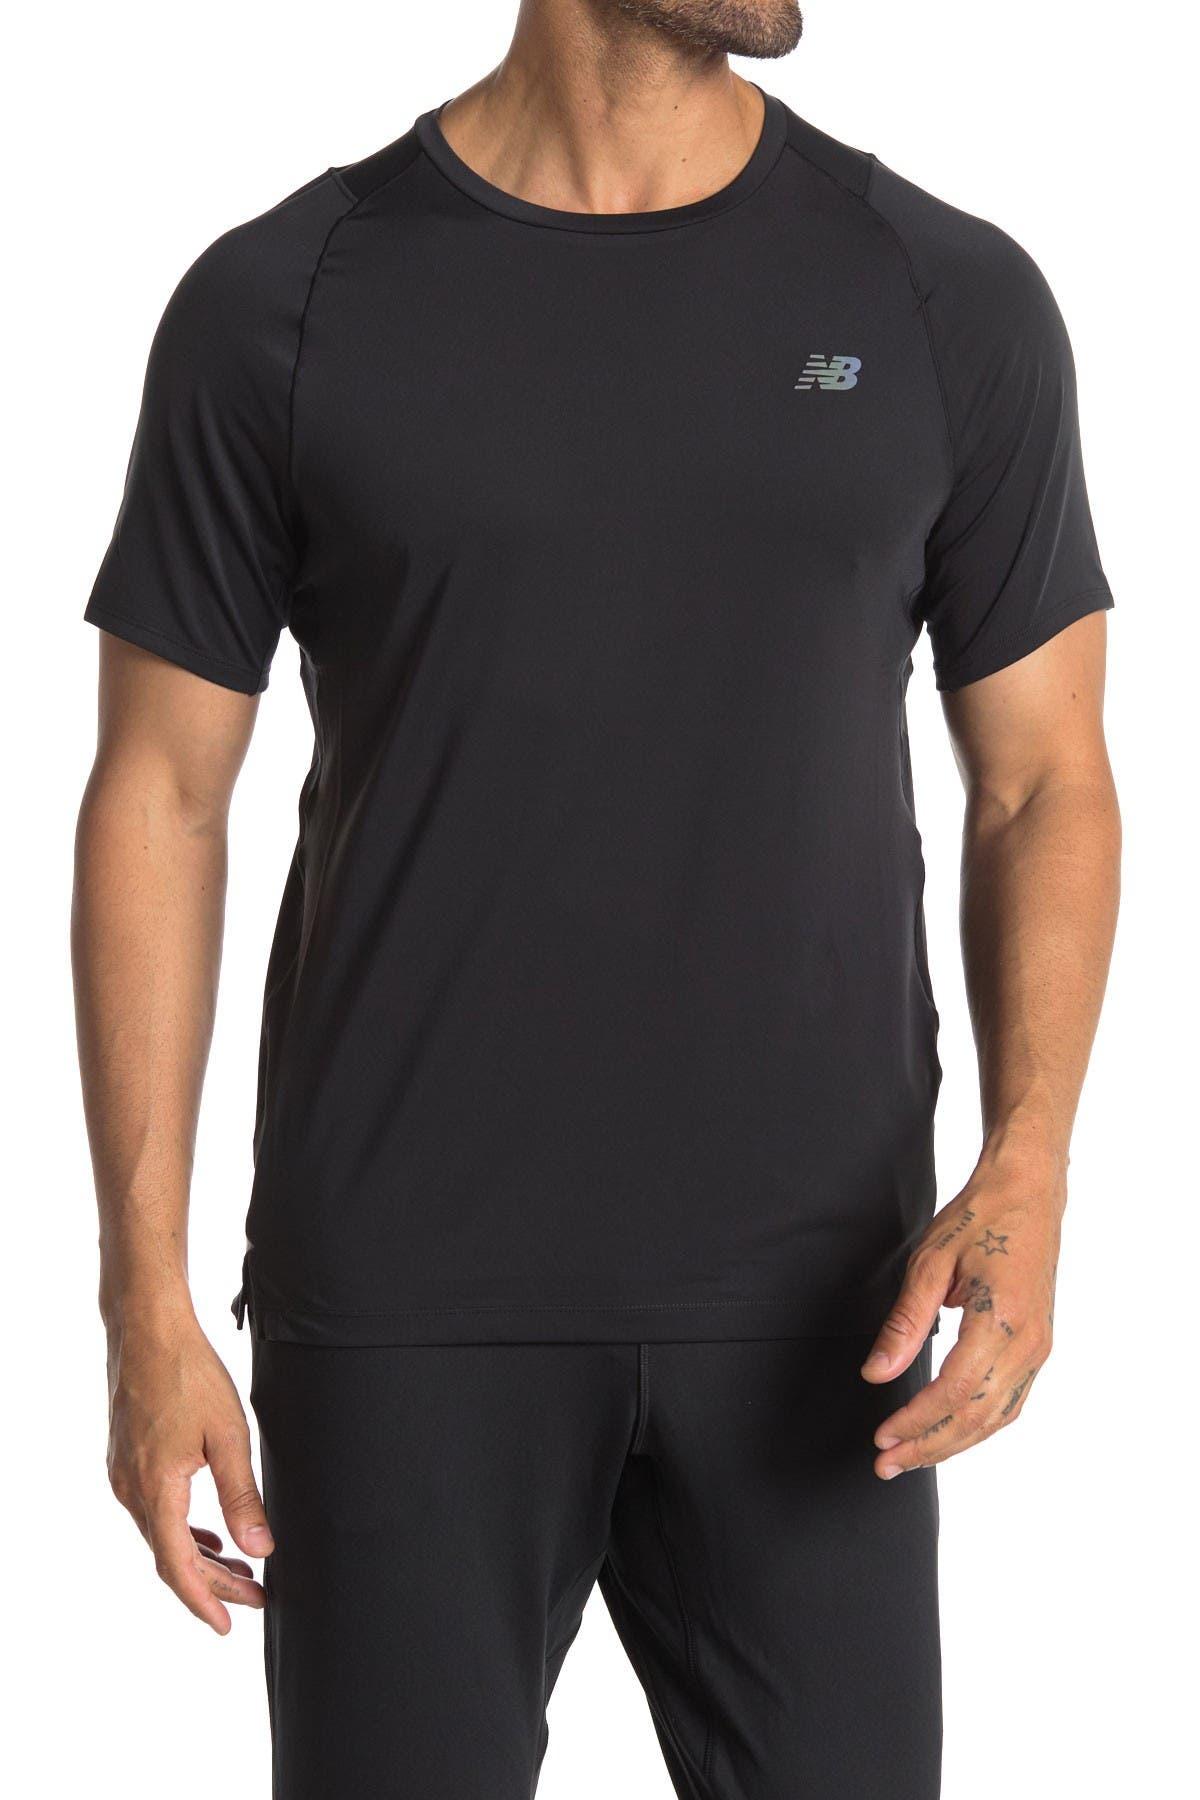 Image of New Balance Seasonless Short Sleeve Tee